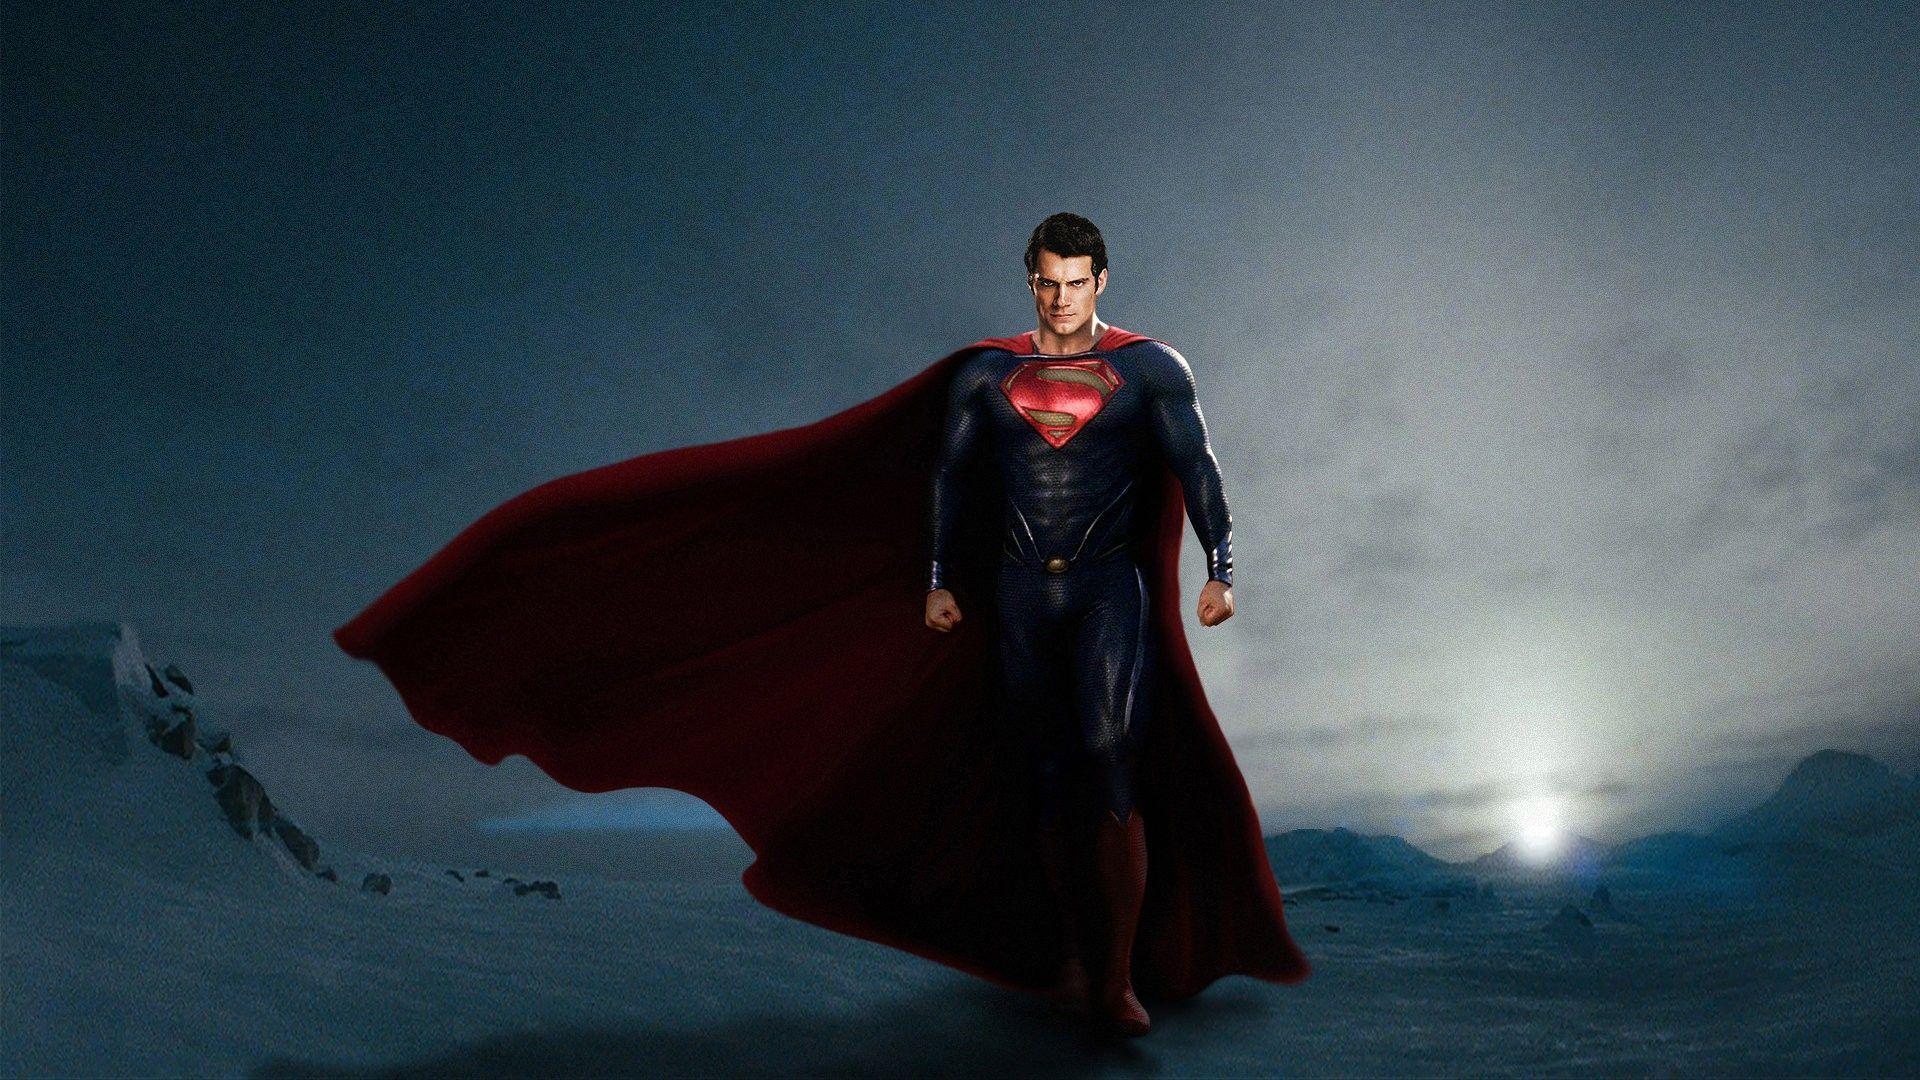 man of steel superman wallpapers wallpaper cave